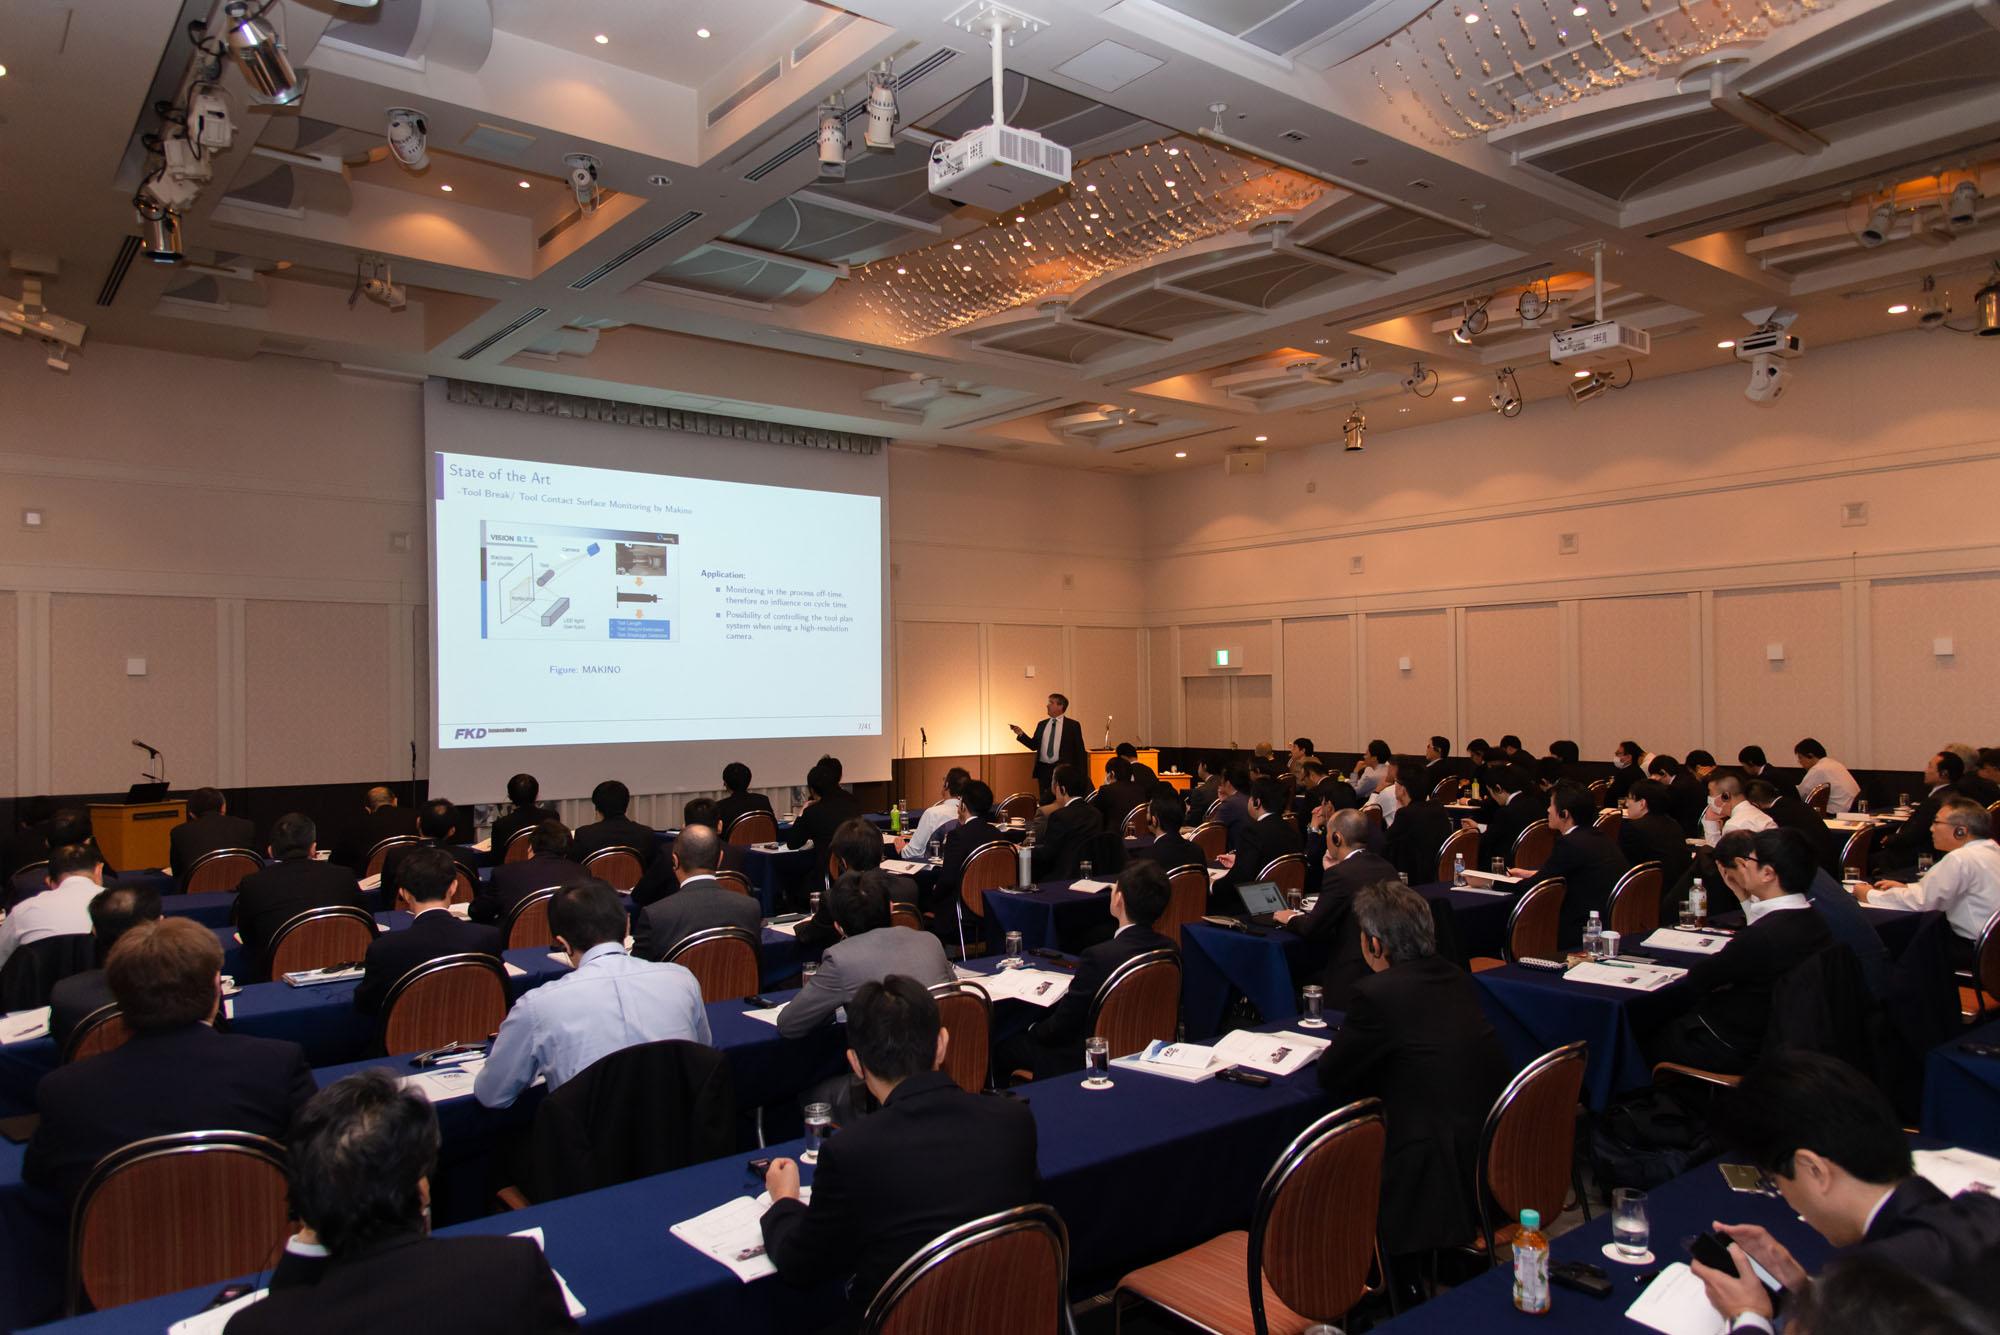 OTT-JAKOB - Unternehmen - Bild - OTT-JAKOB participates in Innovation Days in Tokyo